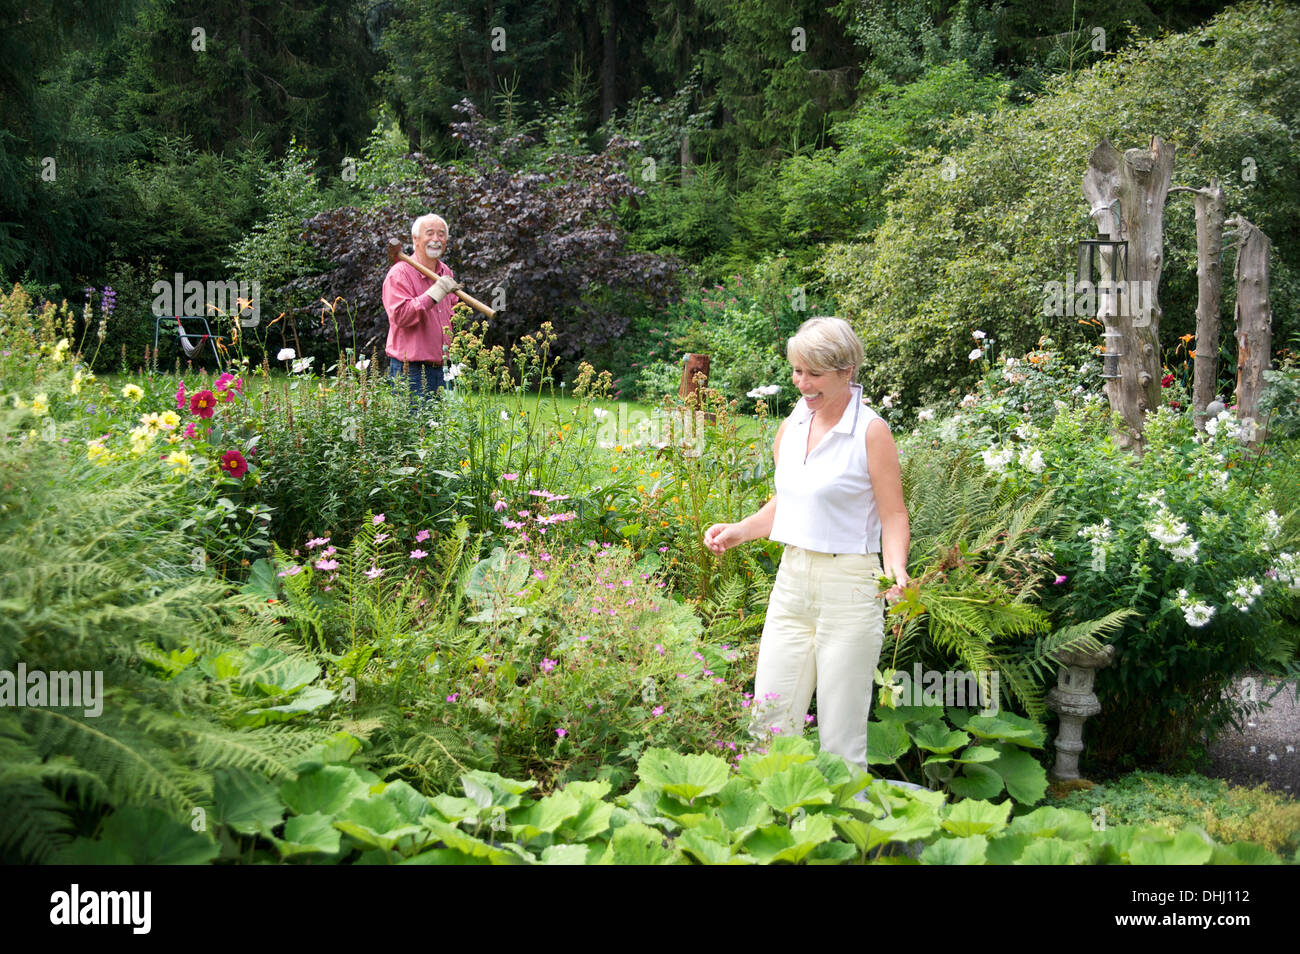 Portrait of senior couple working in garden - Stock Image